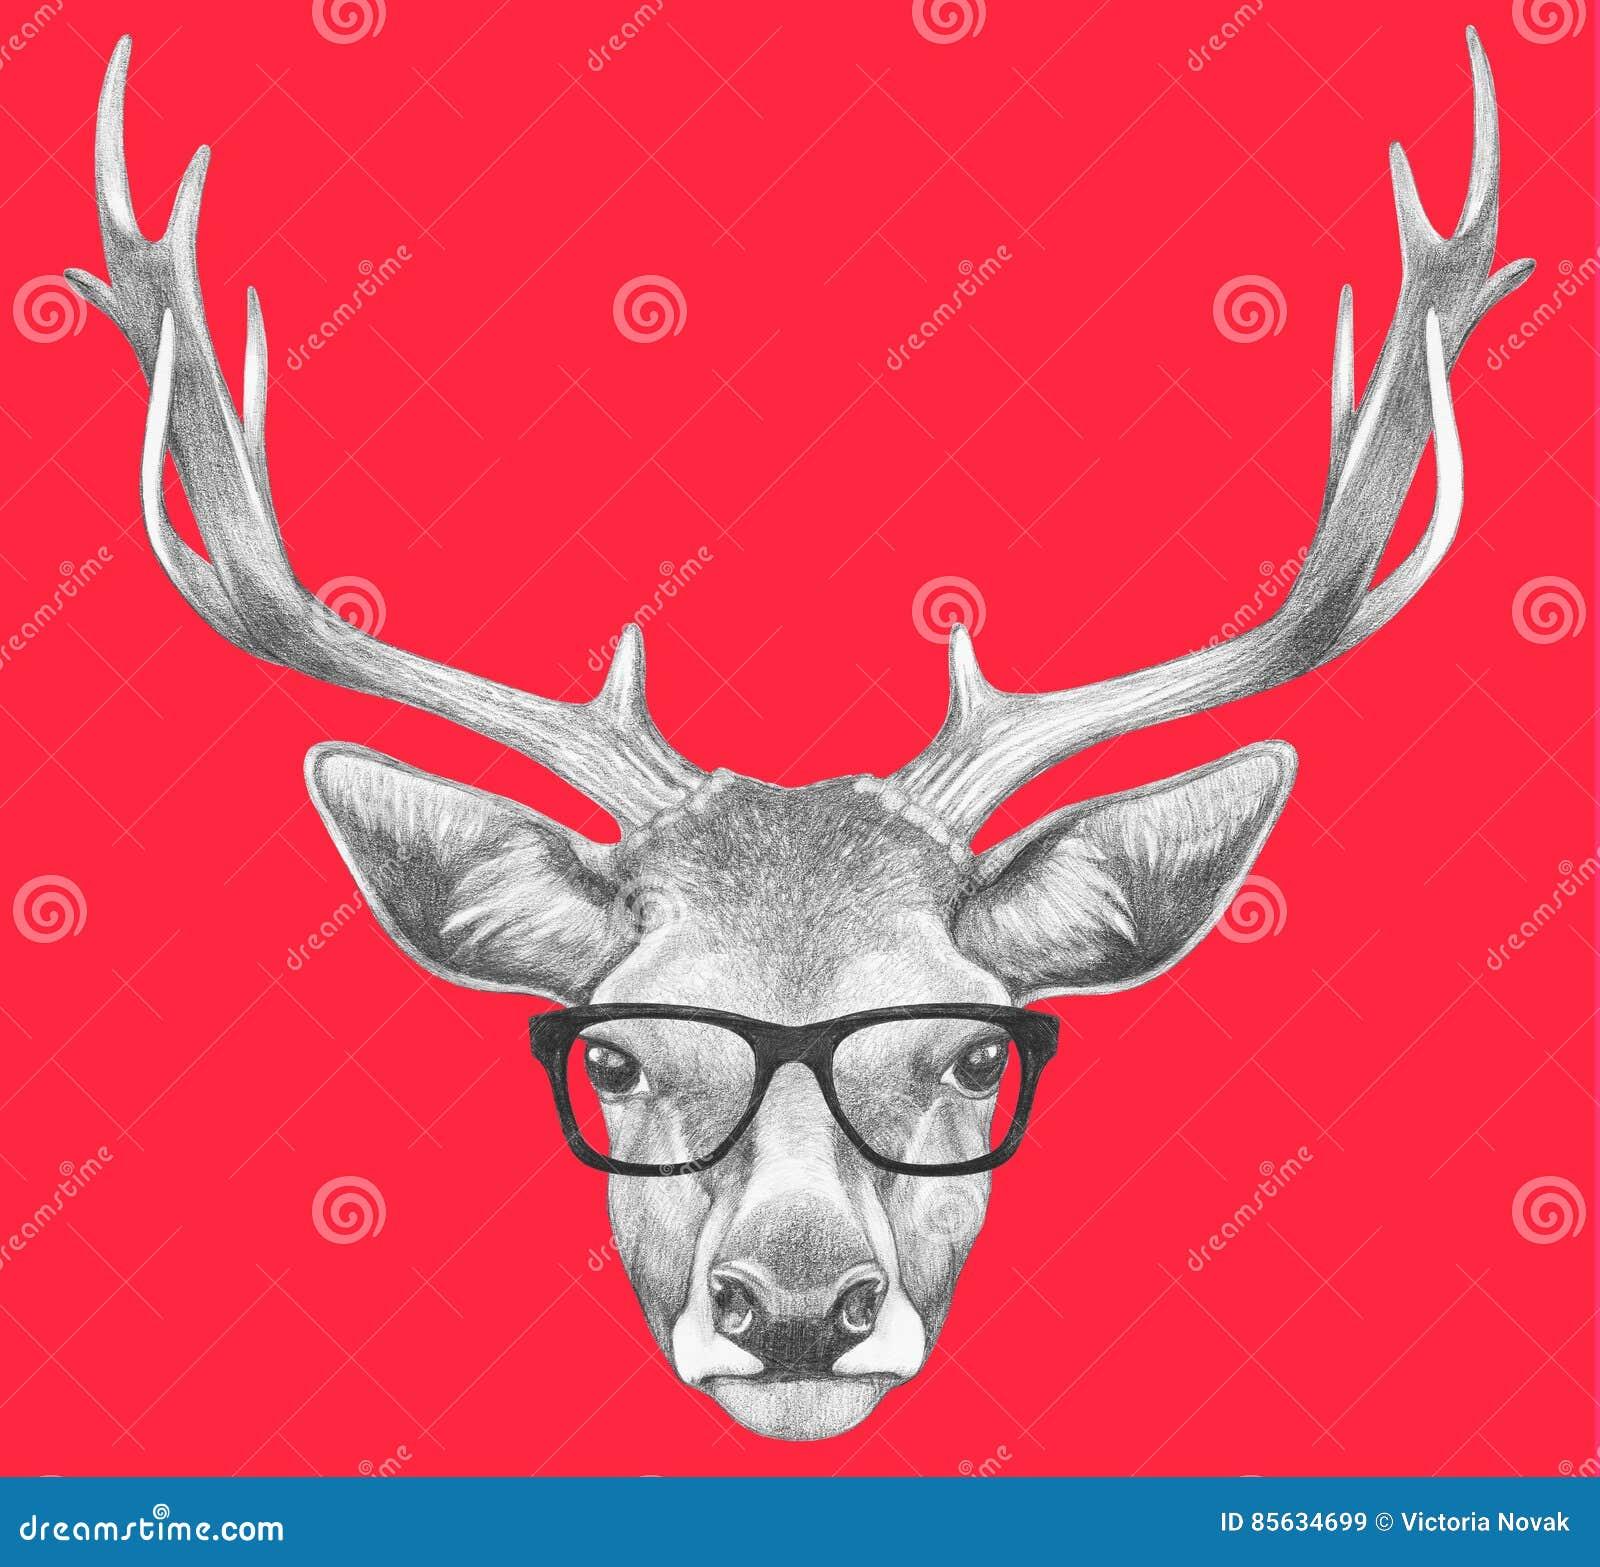 77a30c14a5f Portrait Of Deer With Glasses. Stock Illustration - Illustration of ...